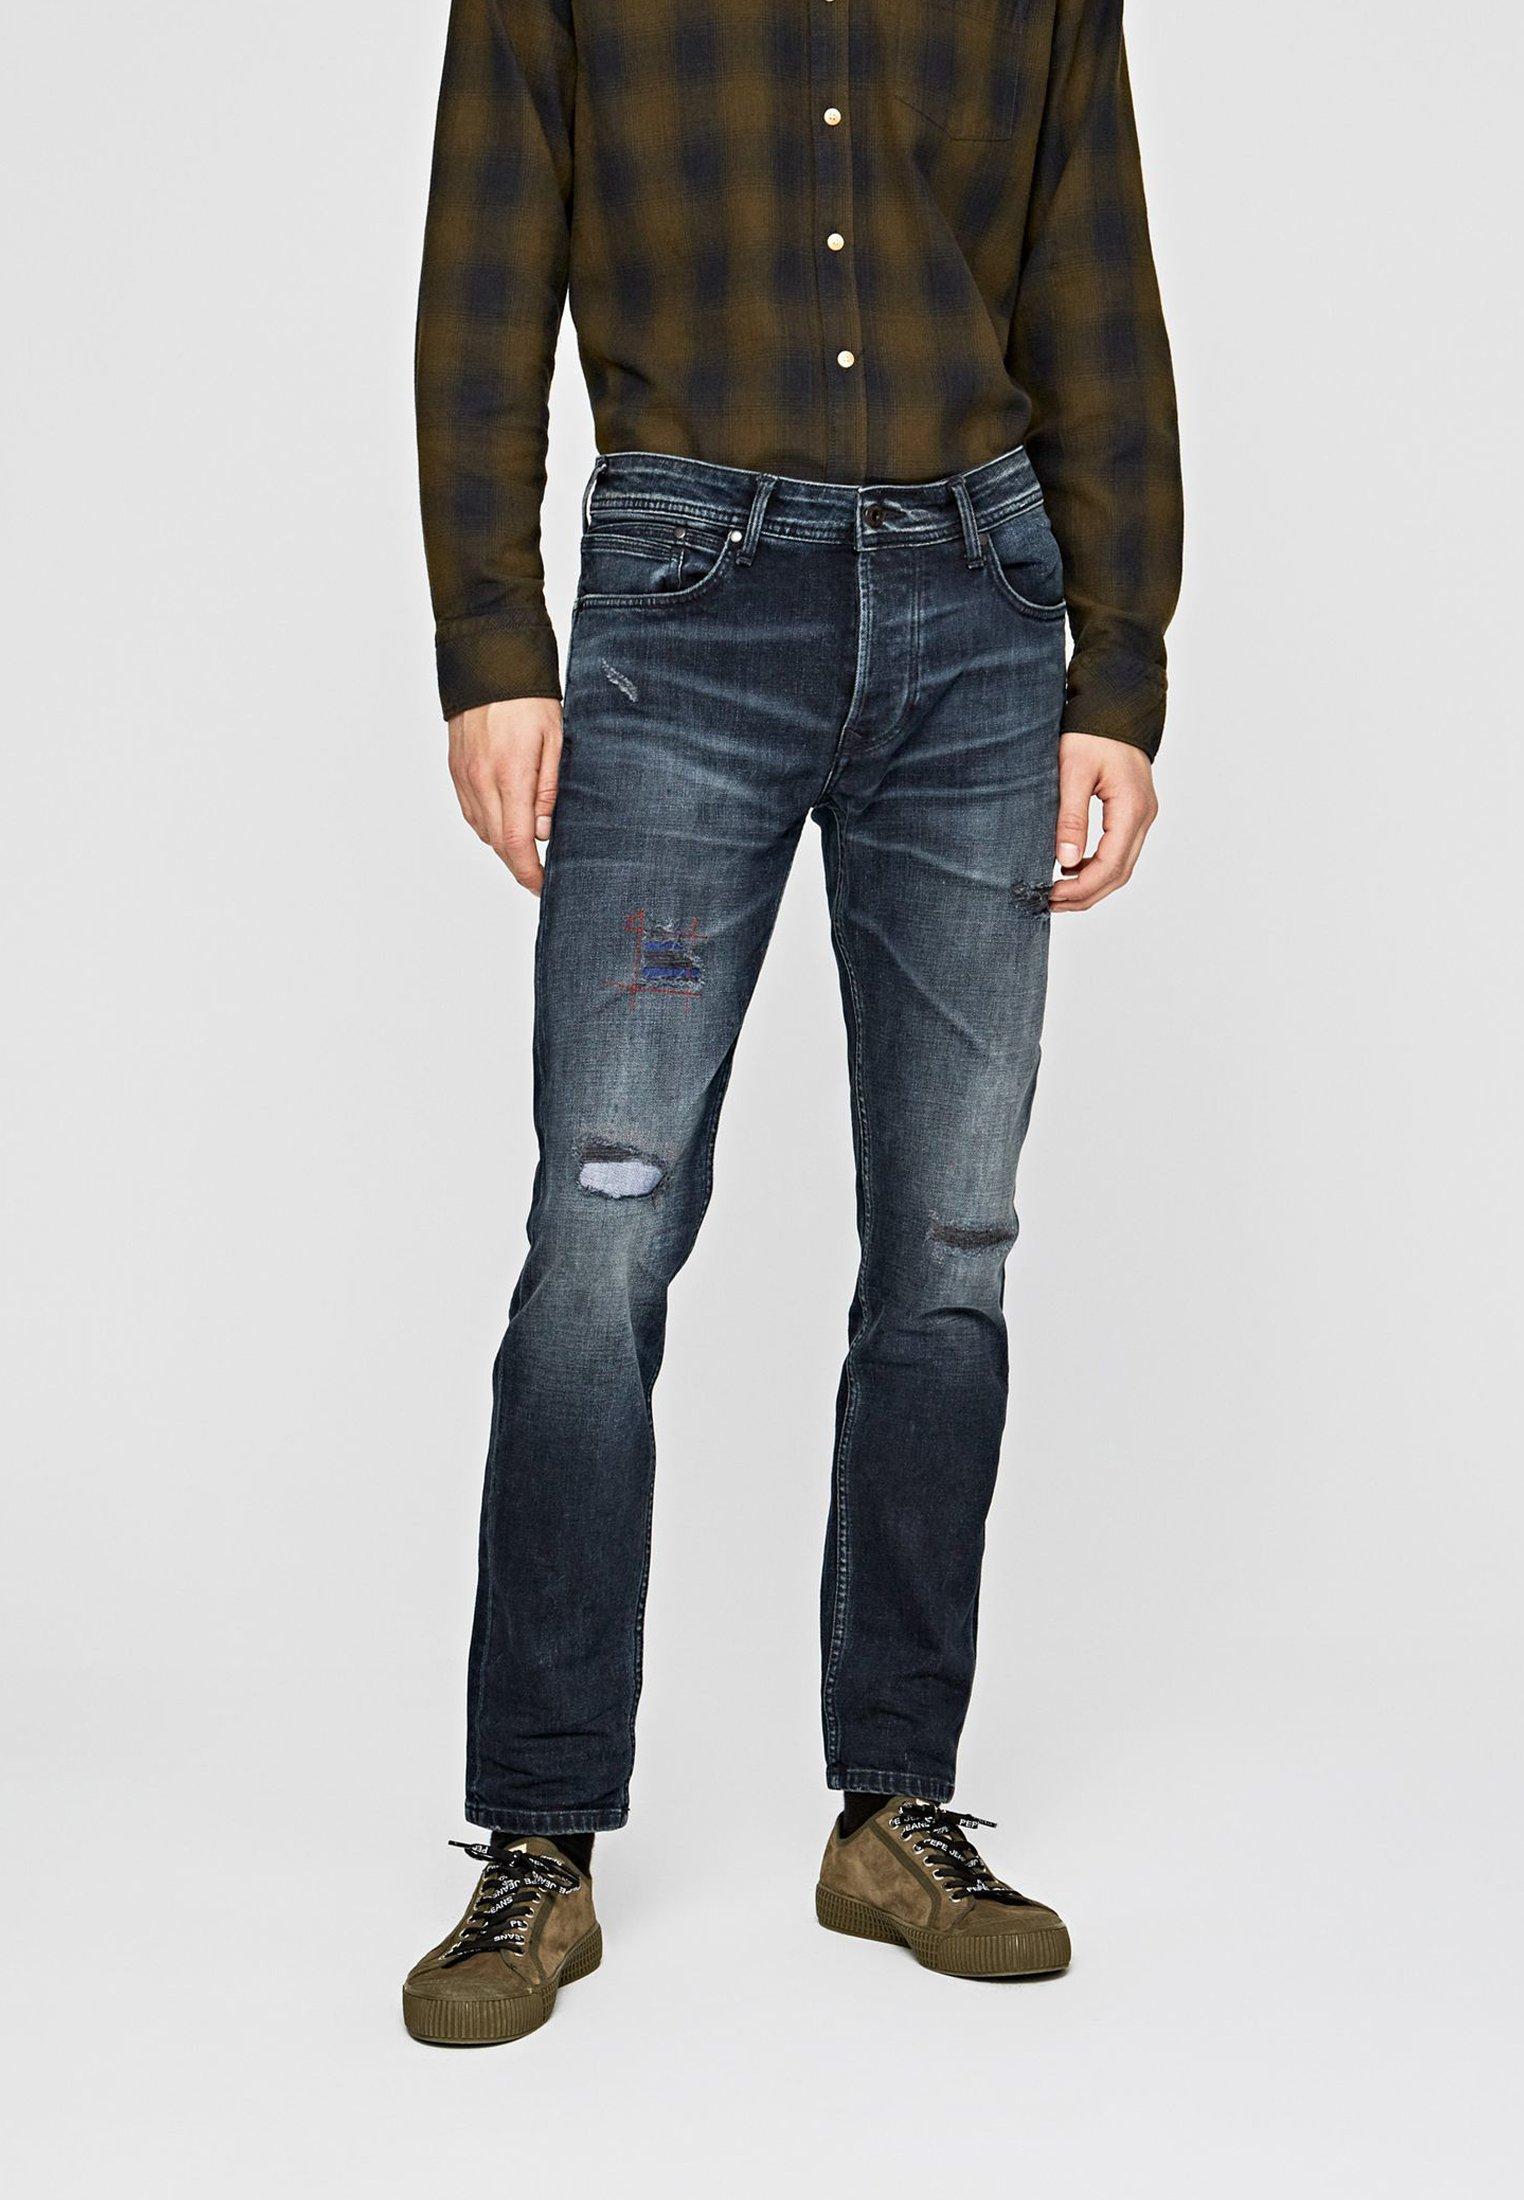 Pepe Denim Fit Jeans Blue Slim mwPyvOn08N